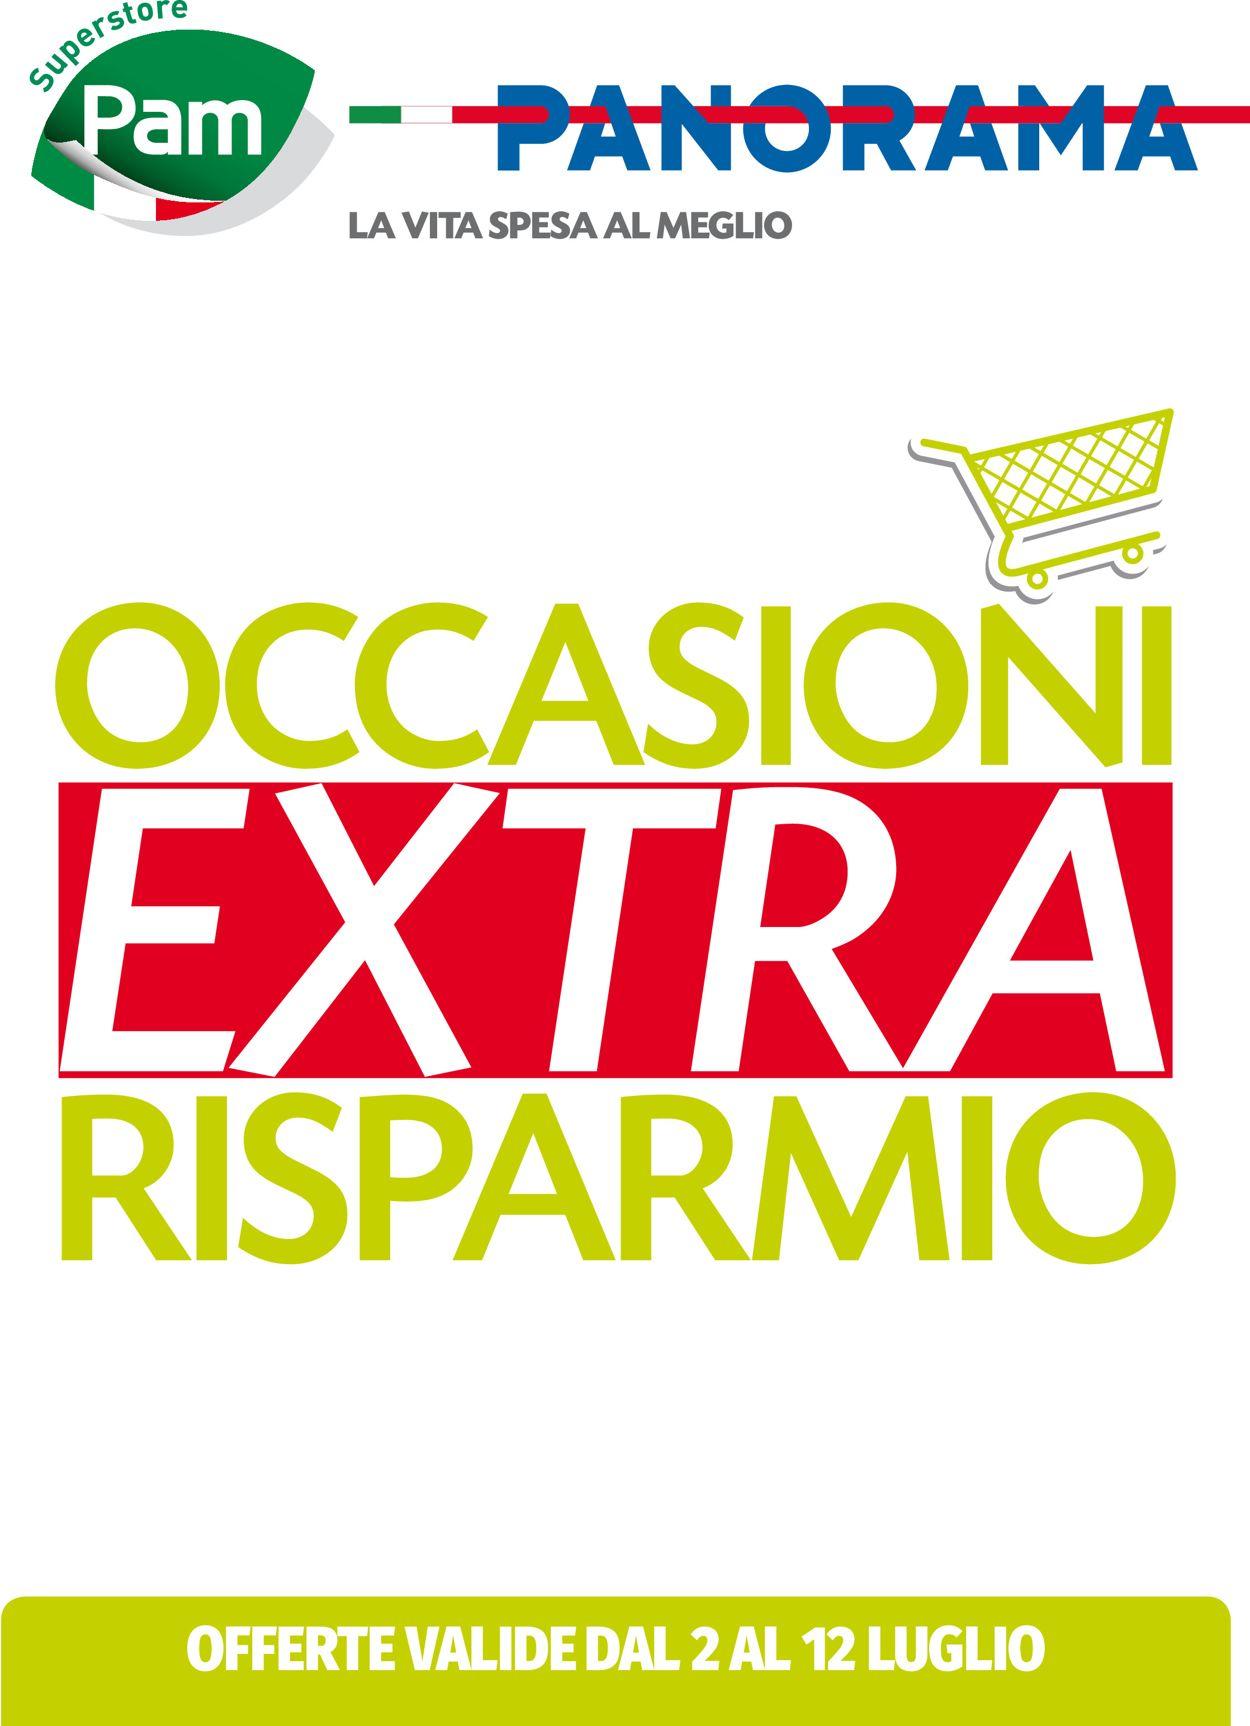 Volantino Pam Panorama - Offerte 02/07-12/07/2020